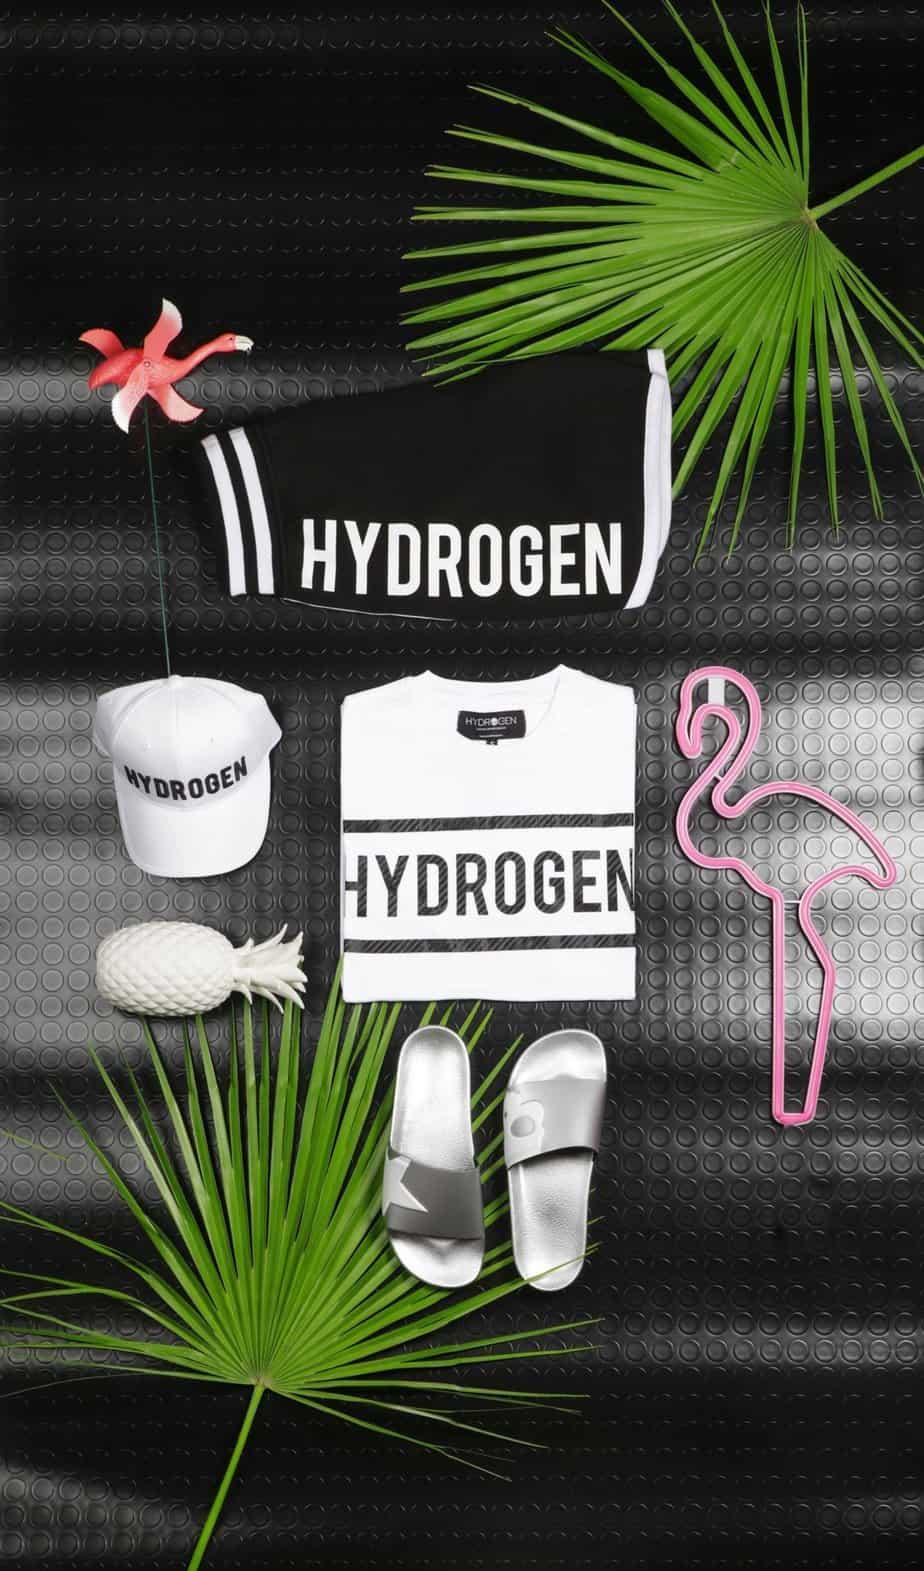 Hydrogen_flatlay_ss18_francescabandiera